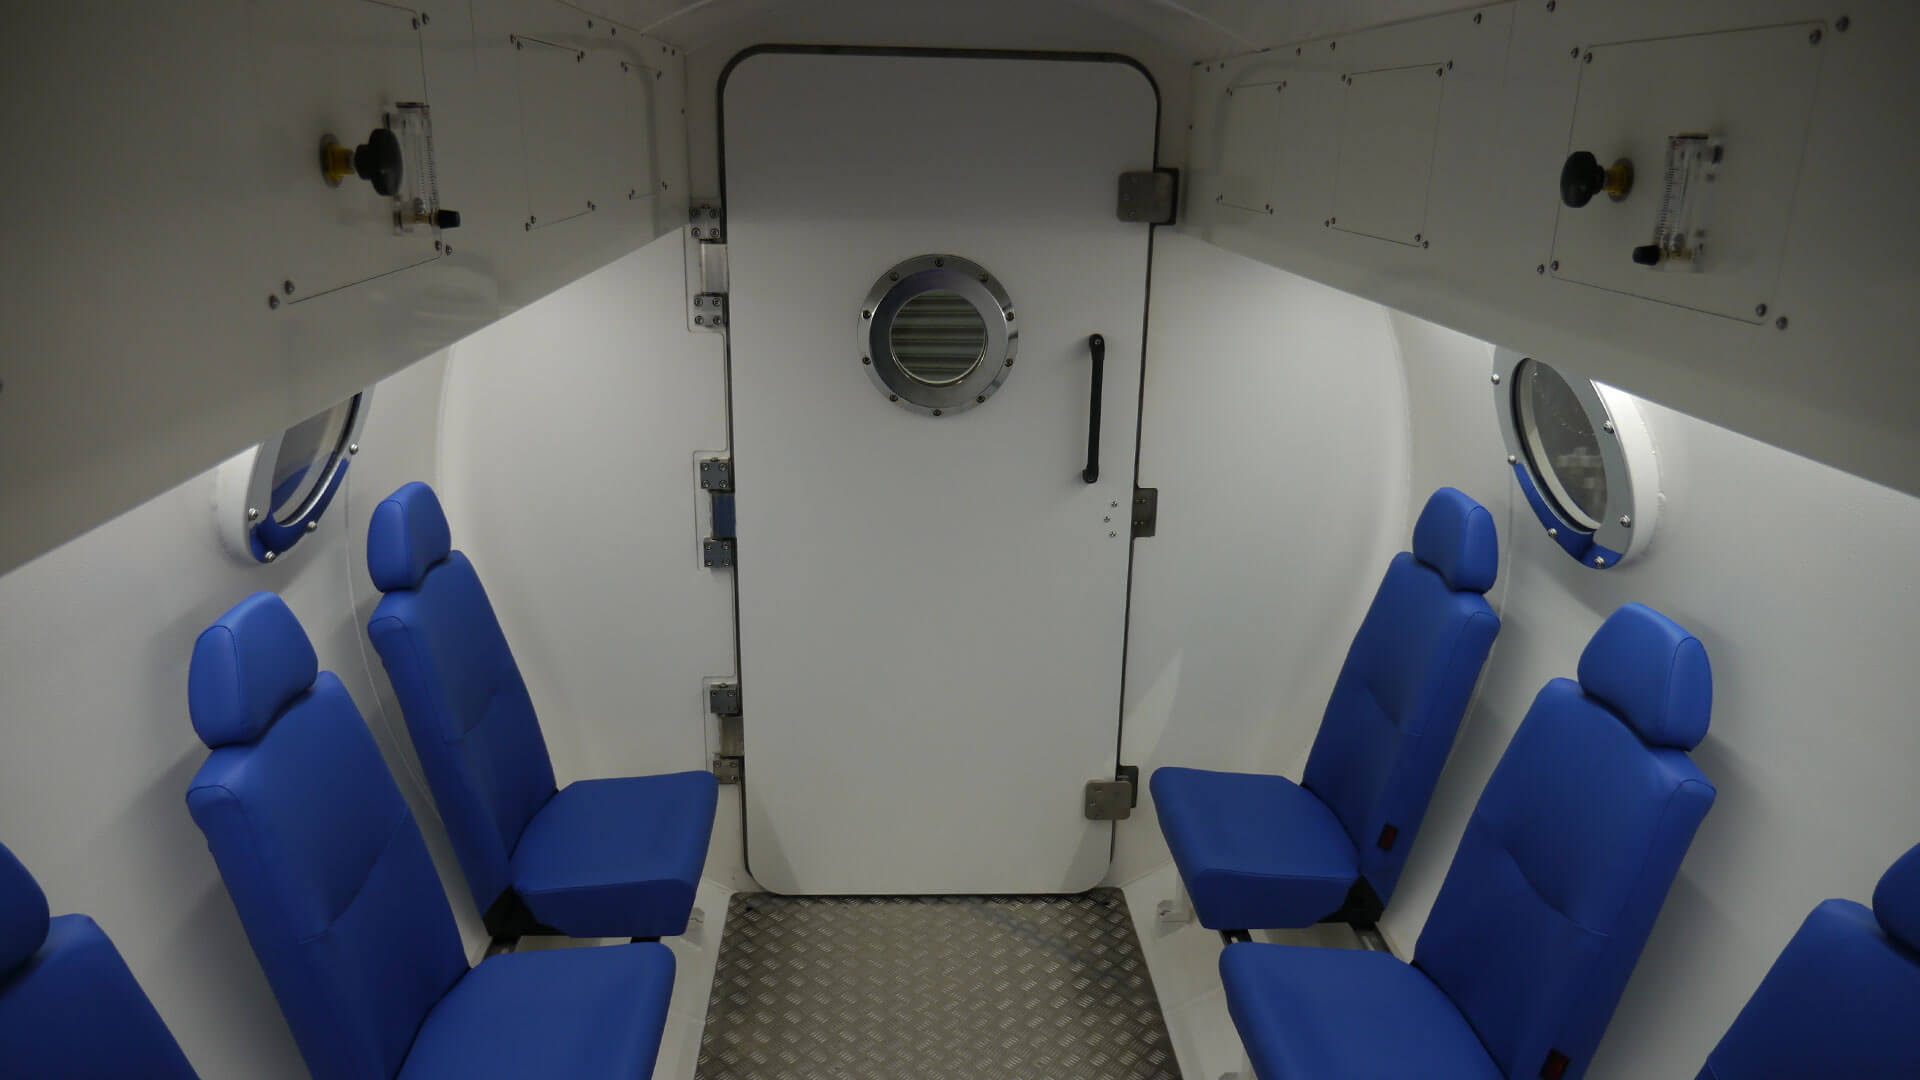 Interior of hyperbaric chamber